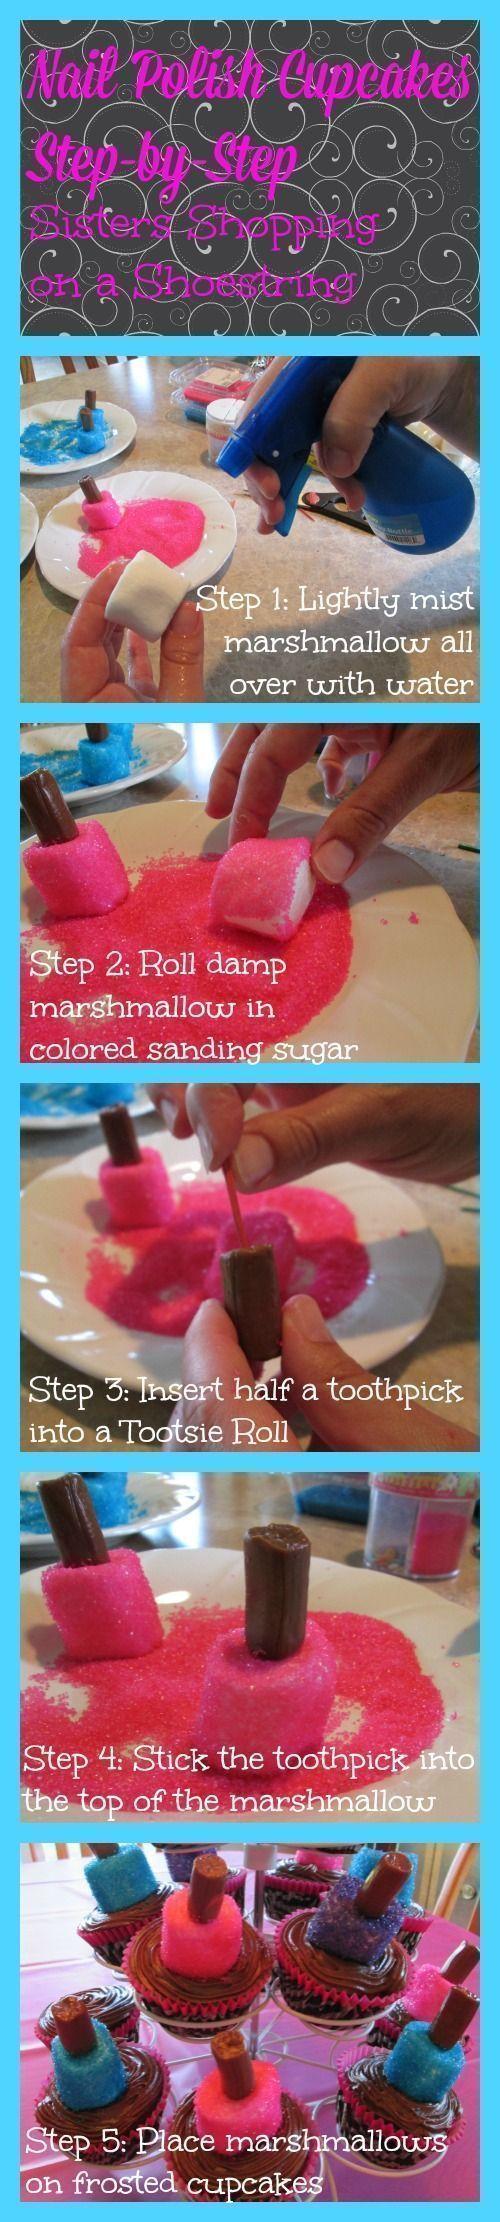 Spa Sleepover Birthday Party: Marshmallow Nail Polish Cupcakes